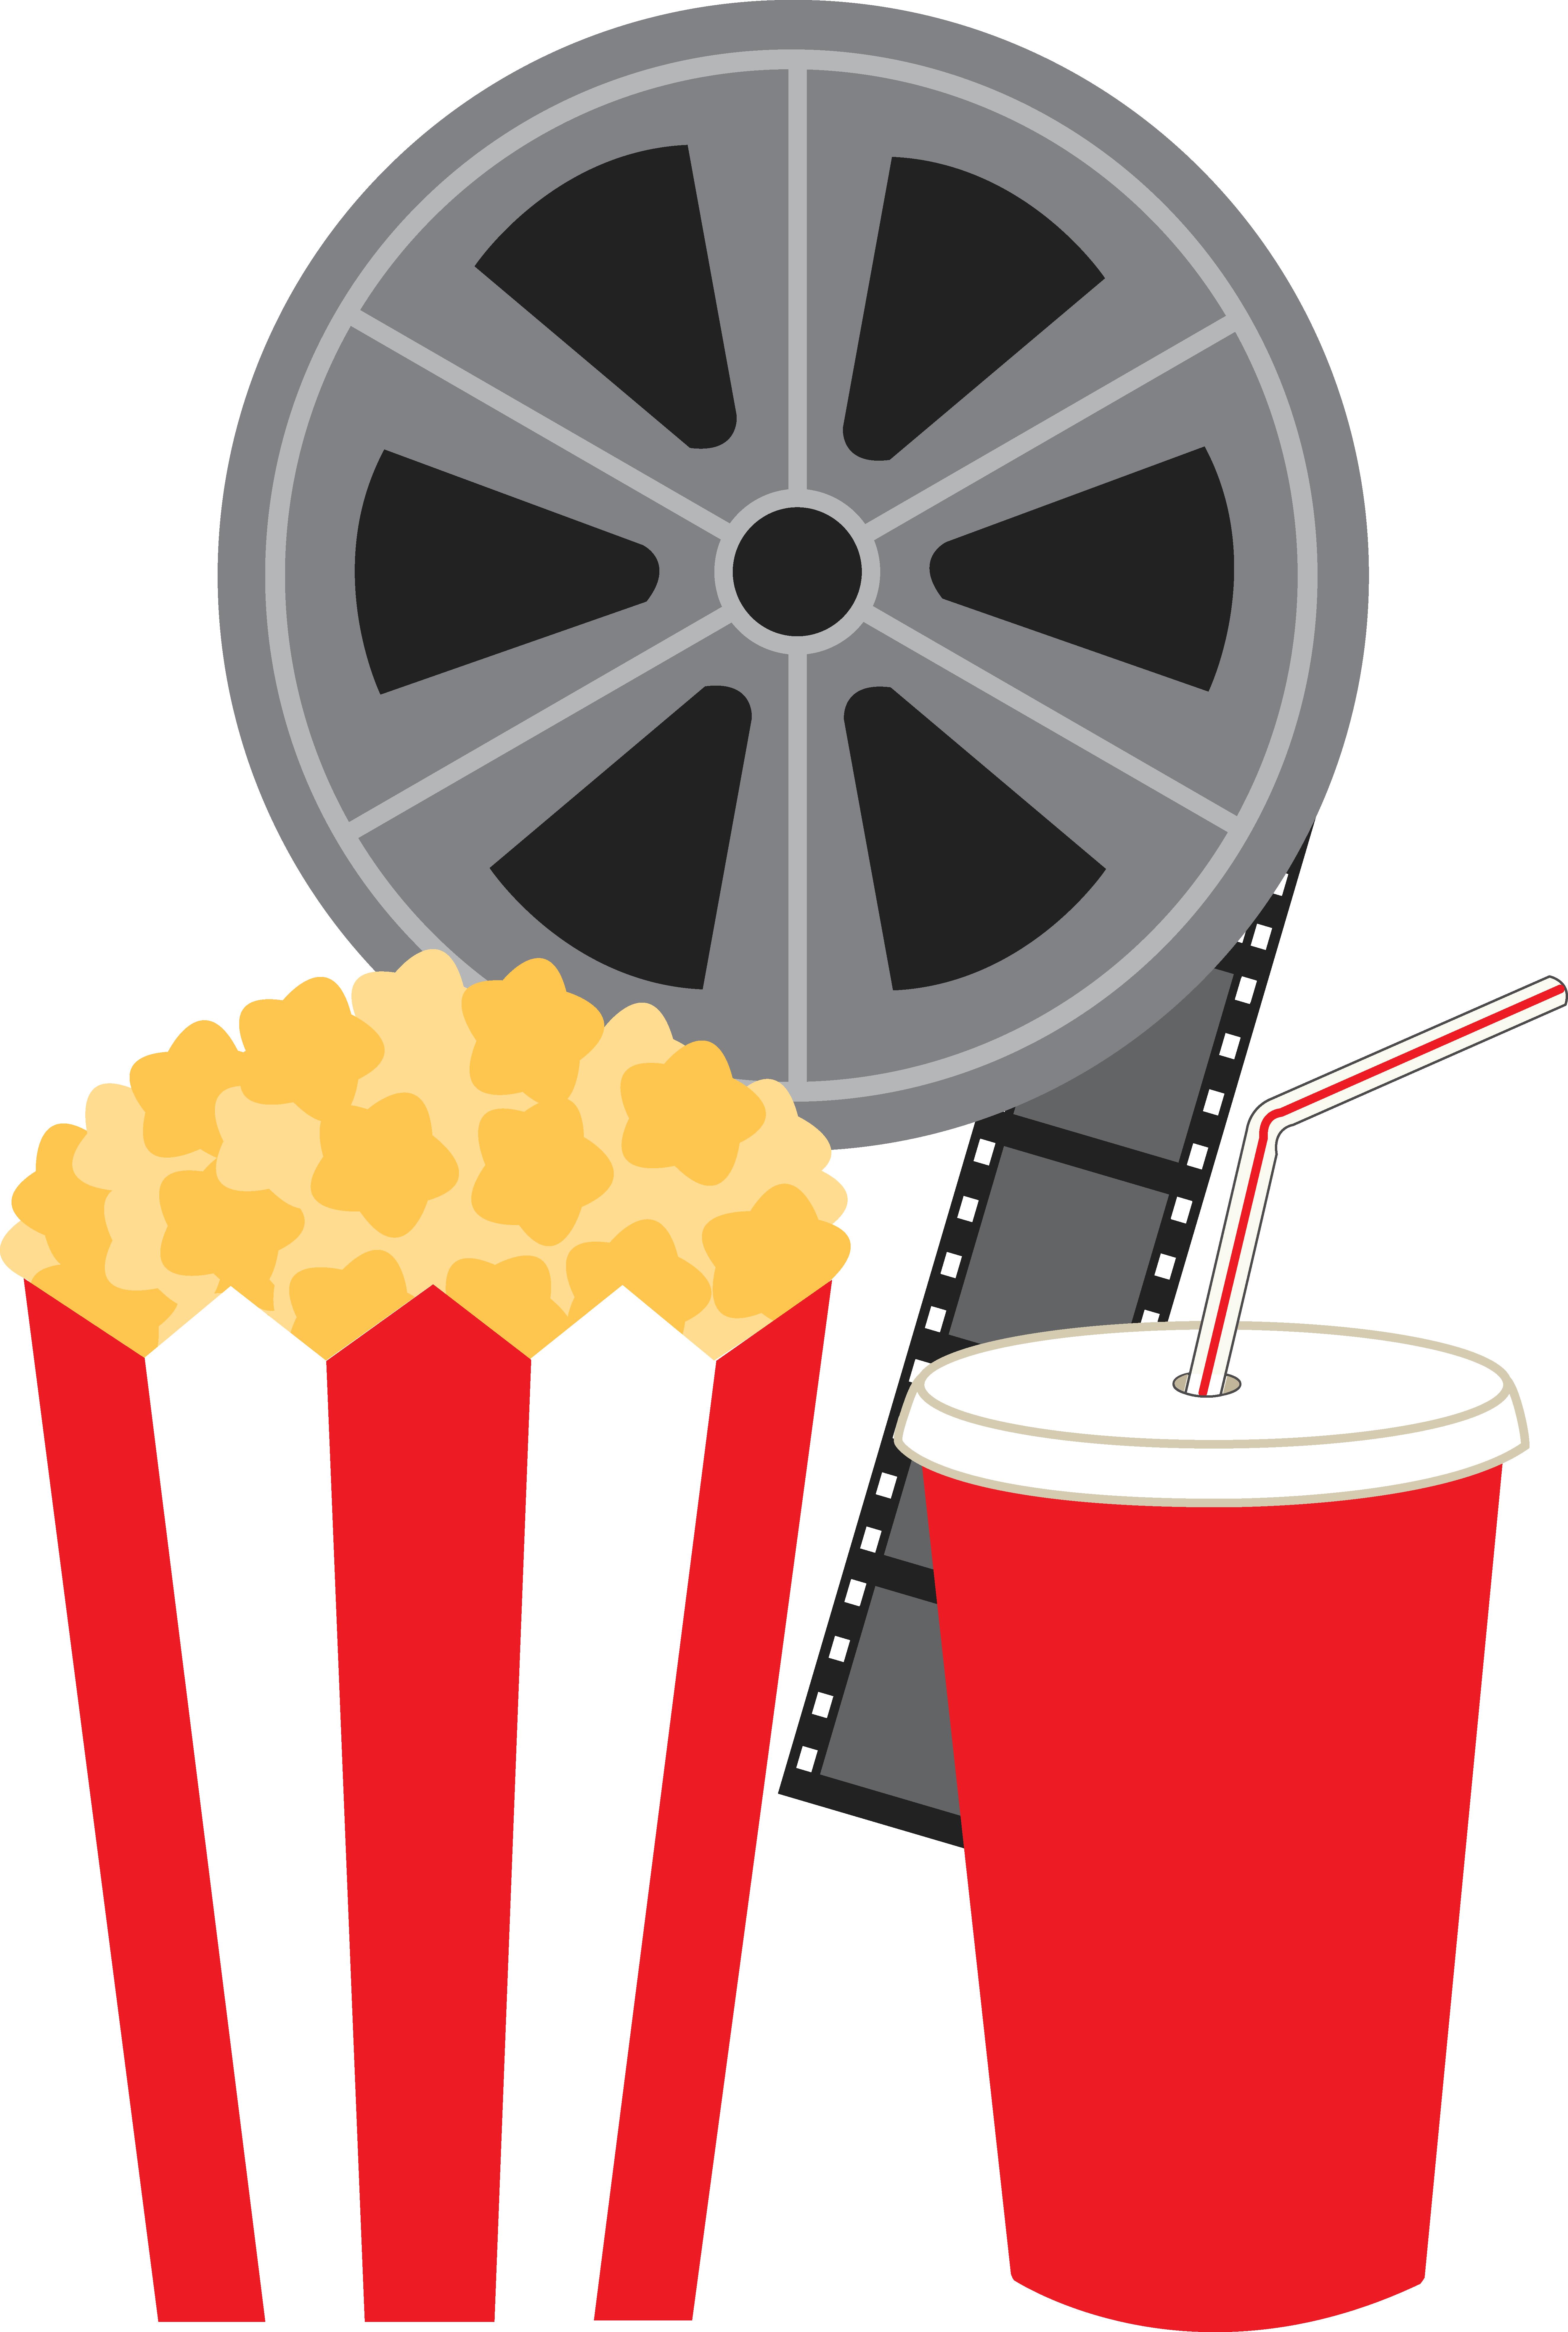 Movie and Popcorn Clip Art